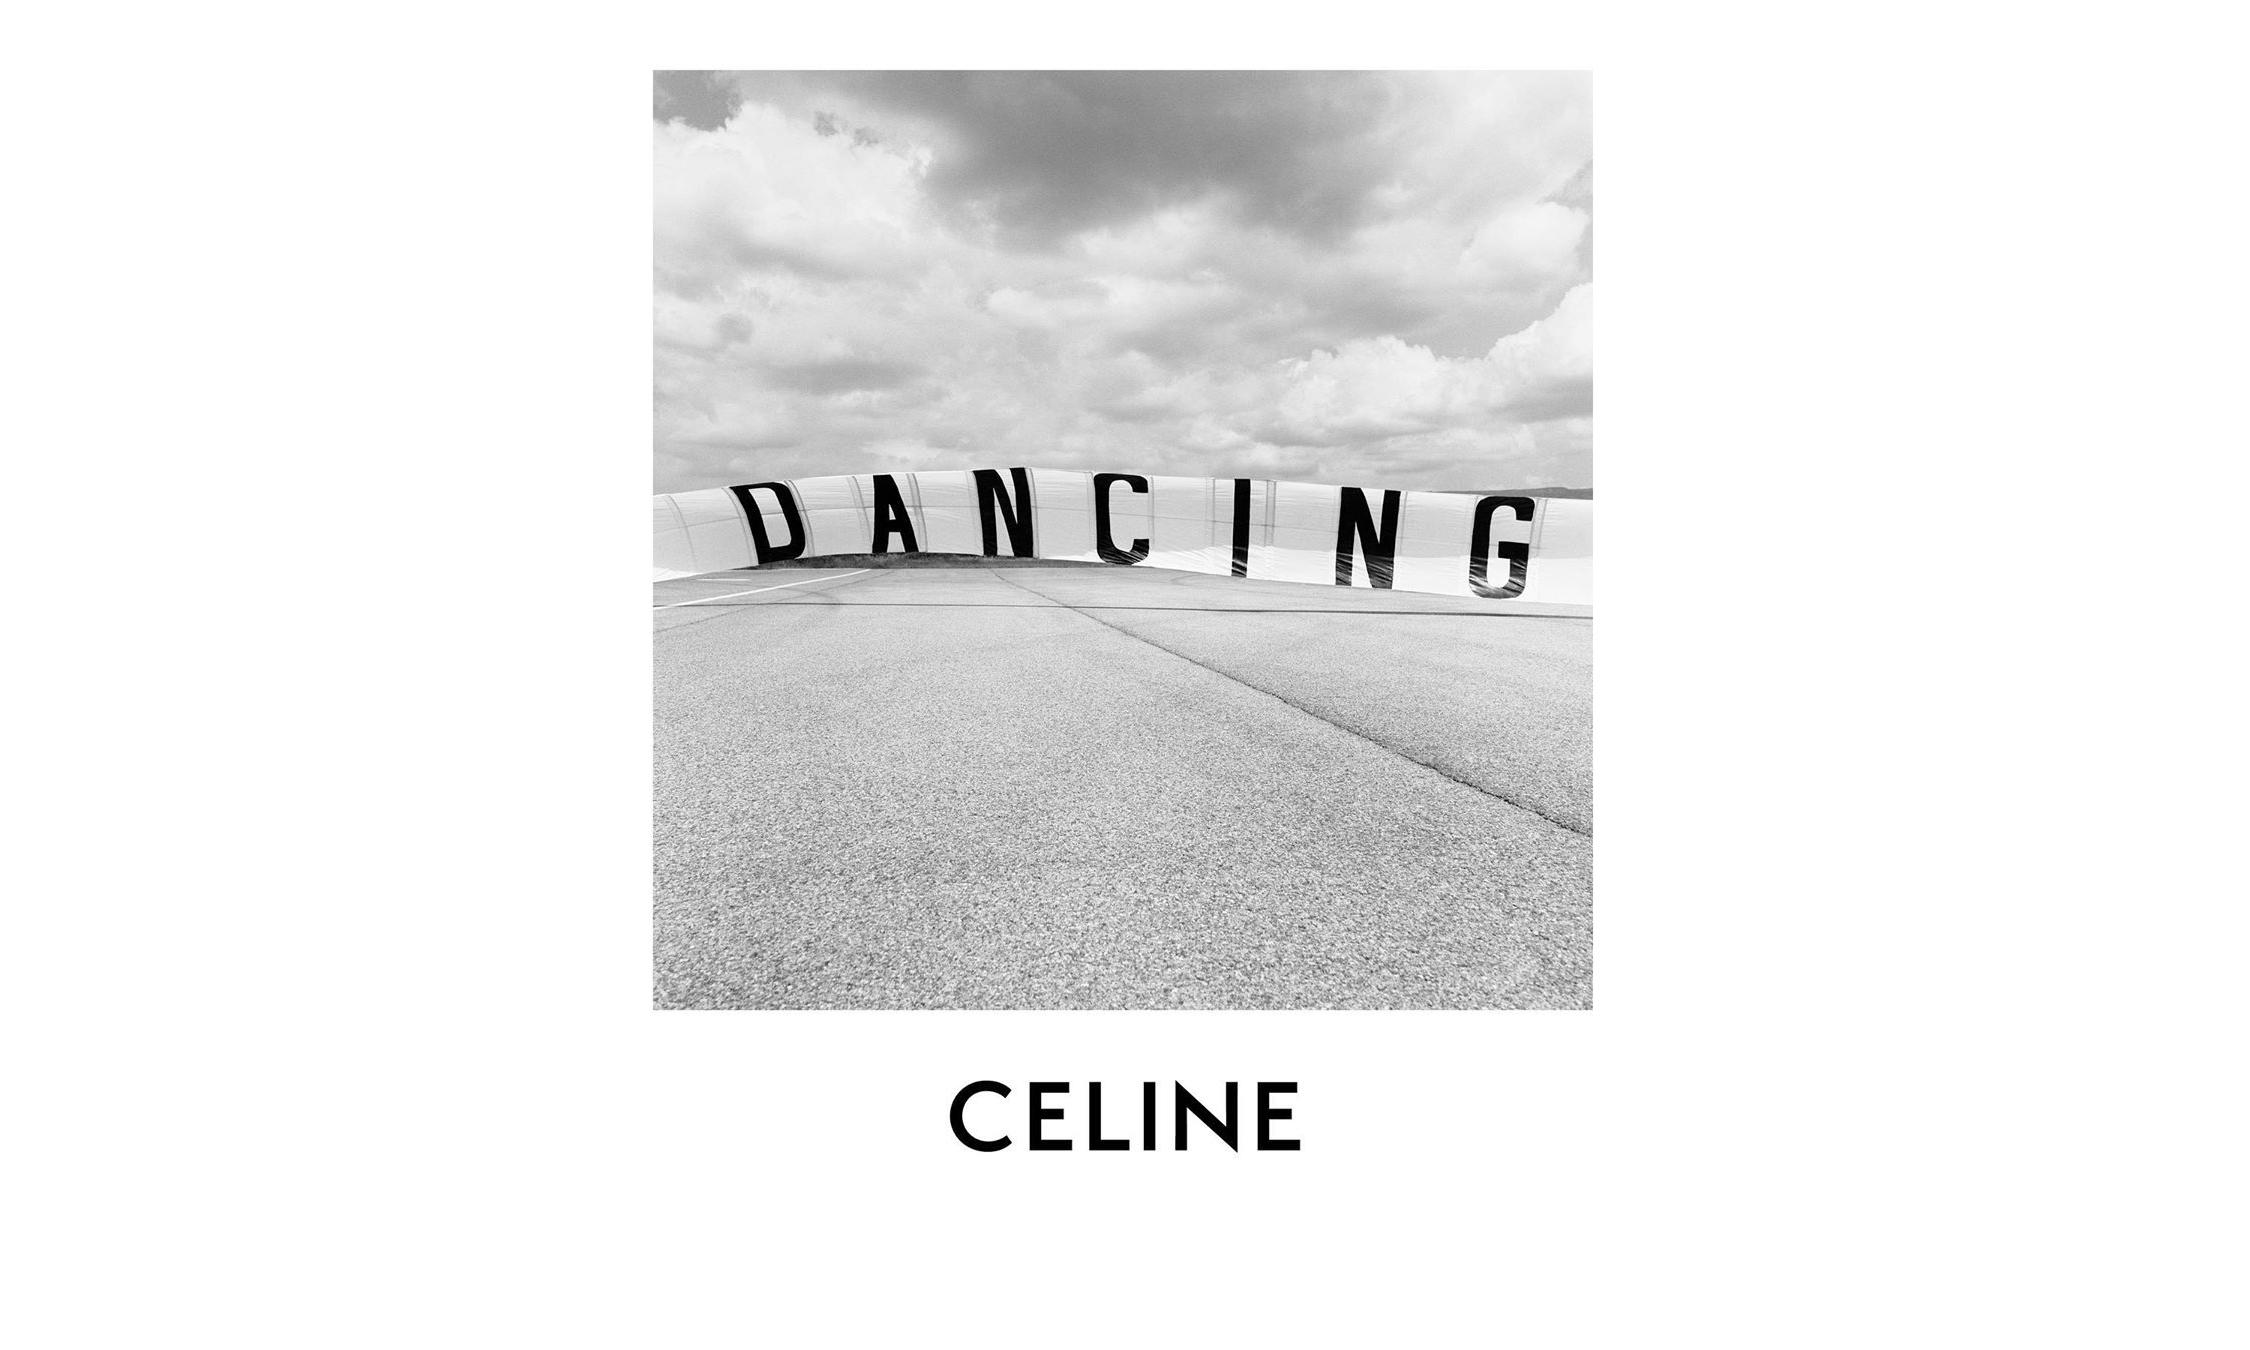 CELINE Homme 系列将于本月底亮相